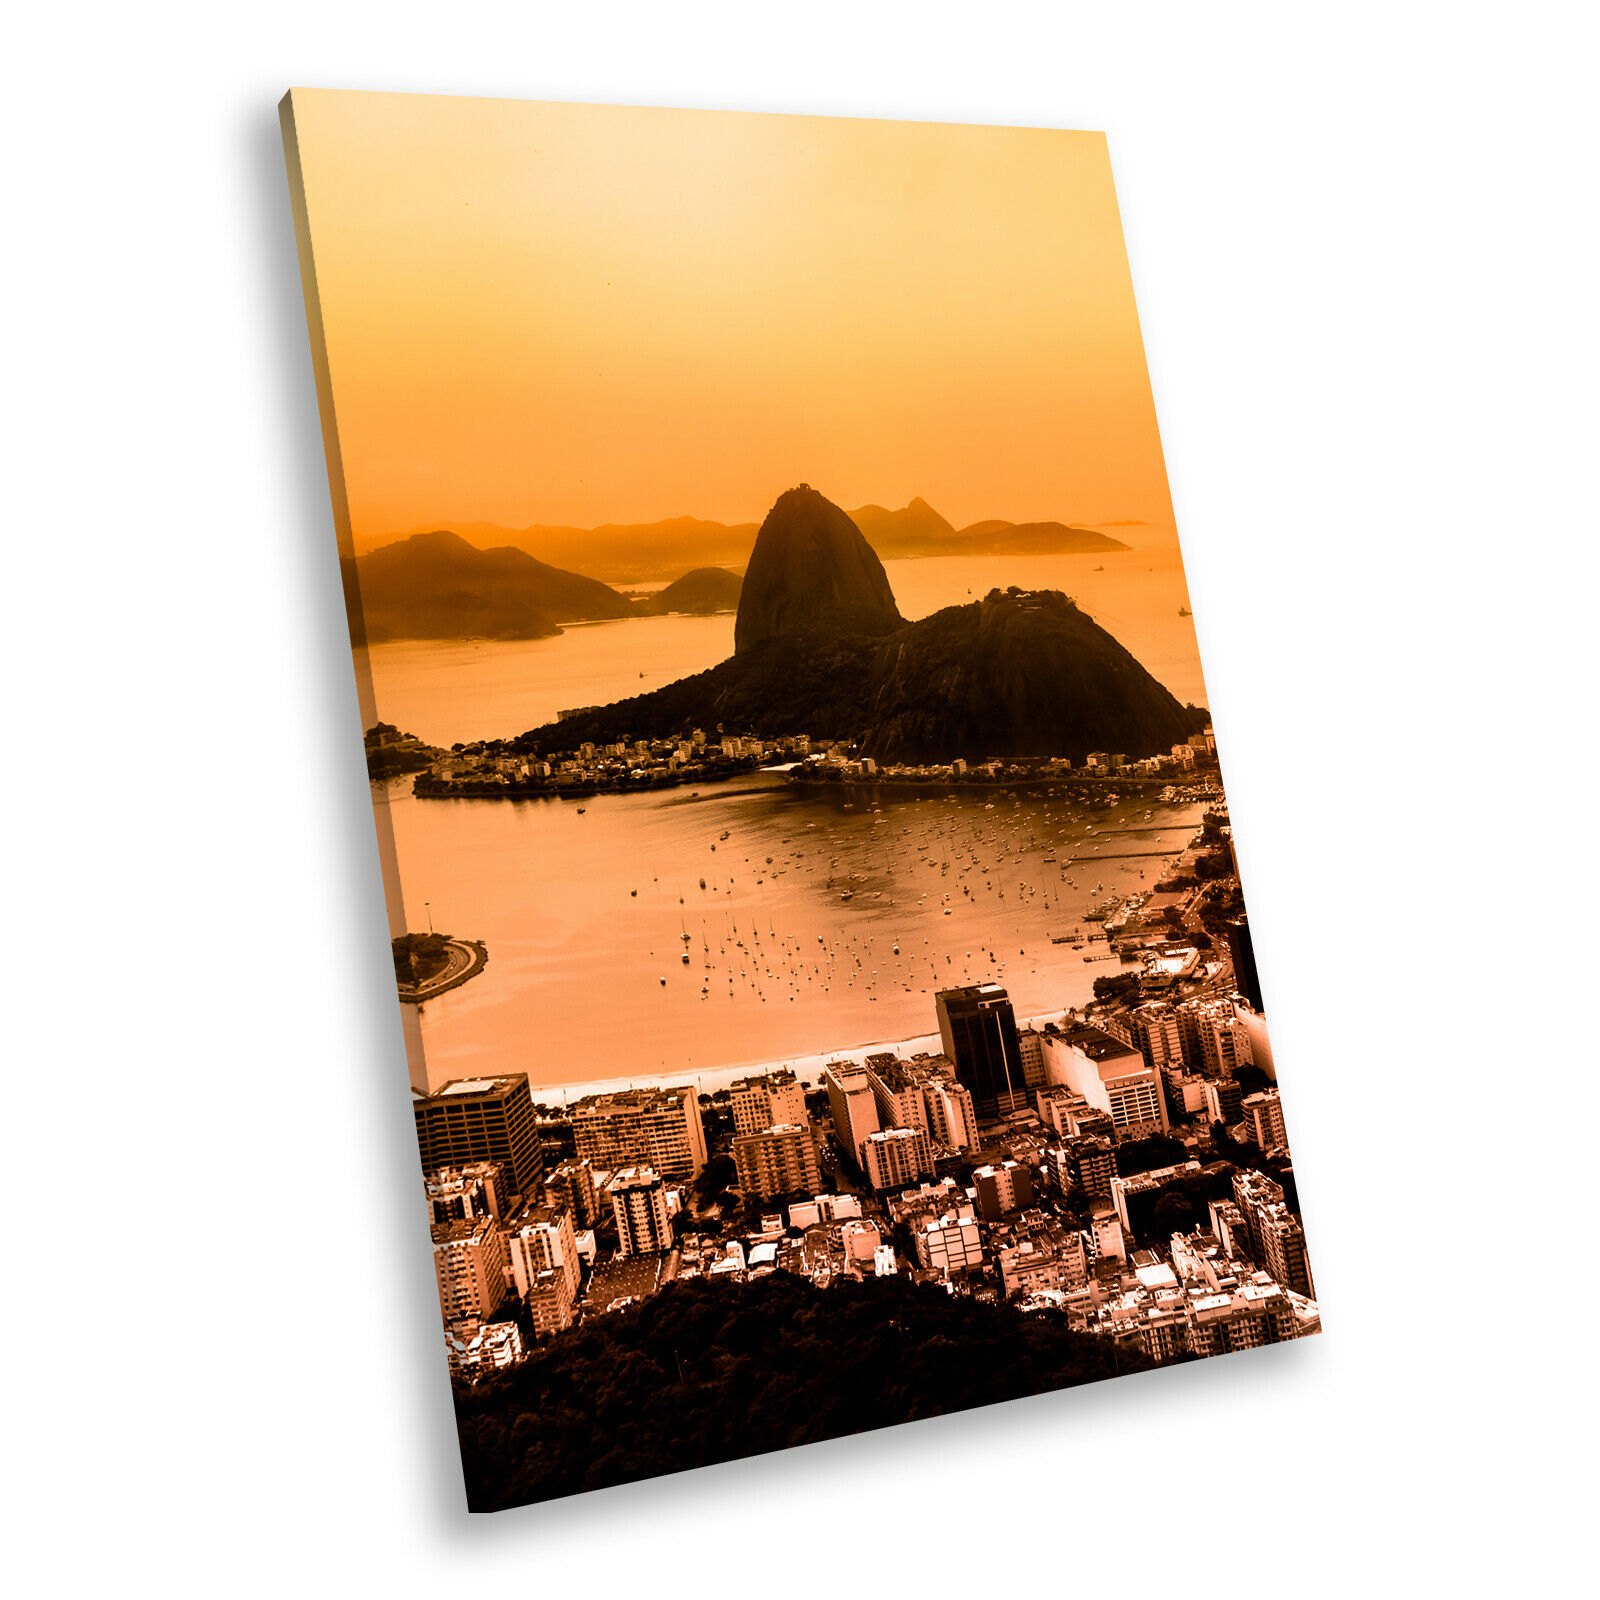 Orange Beach City Skyline Portrait Scenic Canvas Framed Art Large Picture